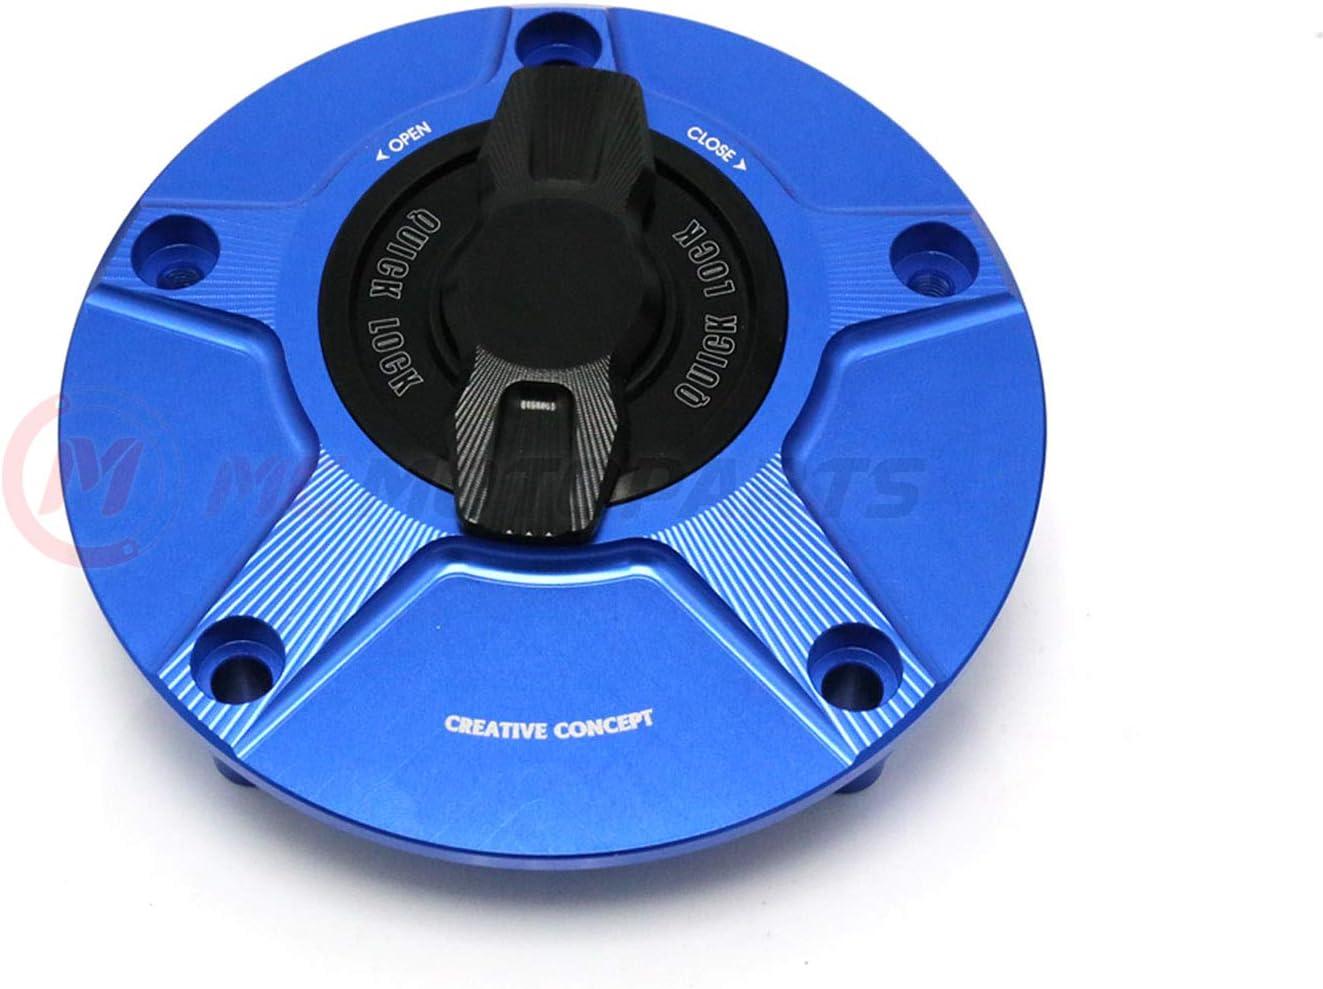 MC Motoparts NIMBLE Rapid Quick Lock Fuel Gas Cap For Yamaha YZF R1 1998-2019 08 09 10 11 12 13 14 15 16 17 Blue Black